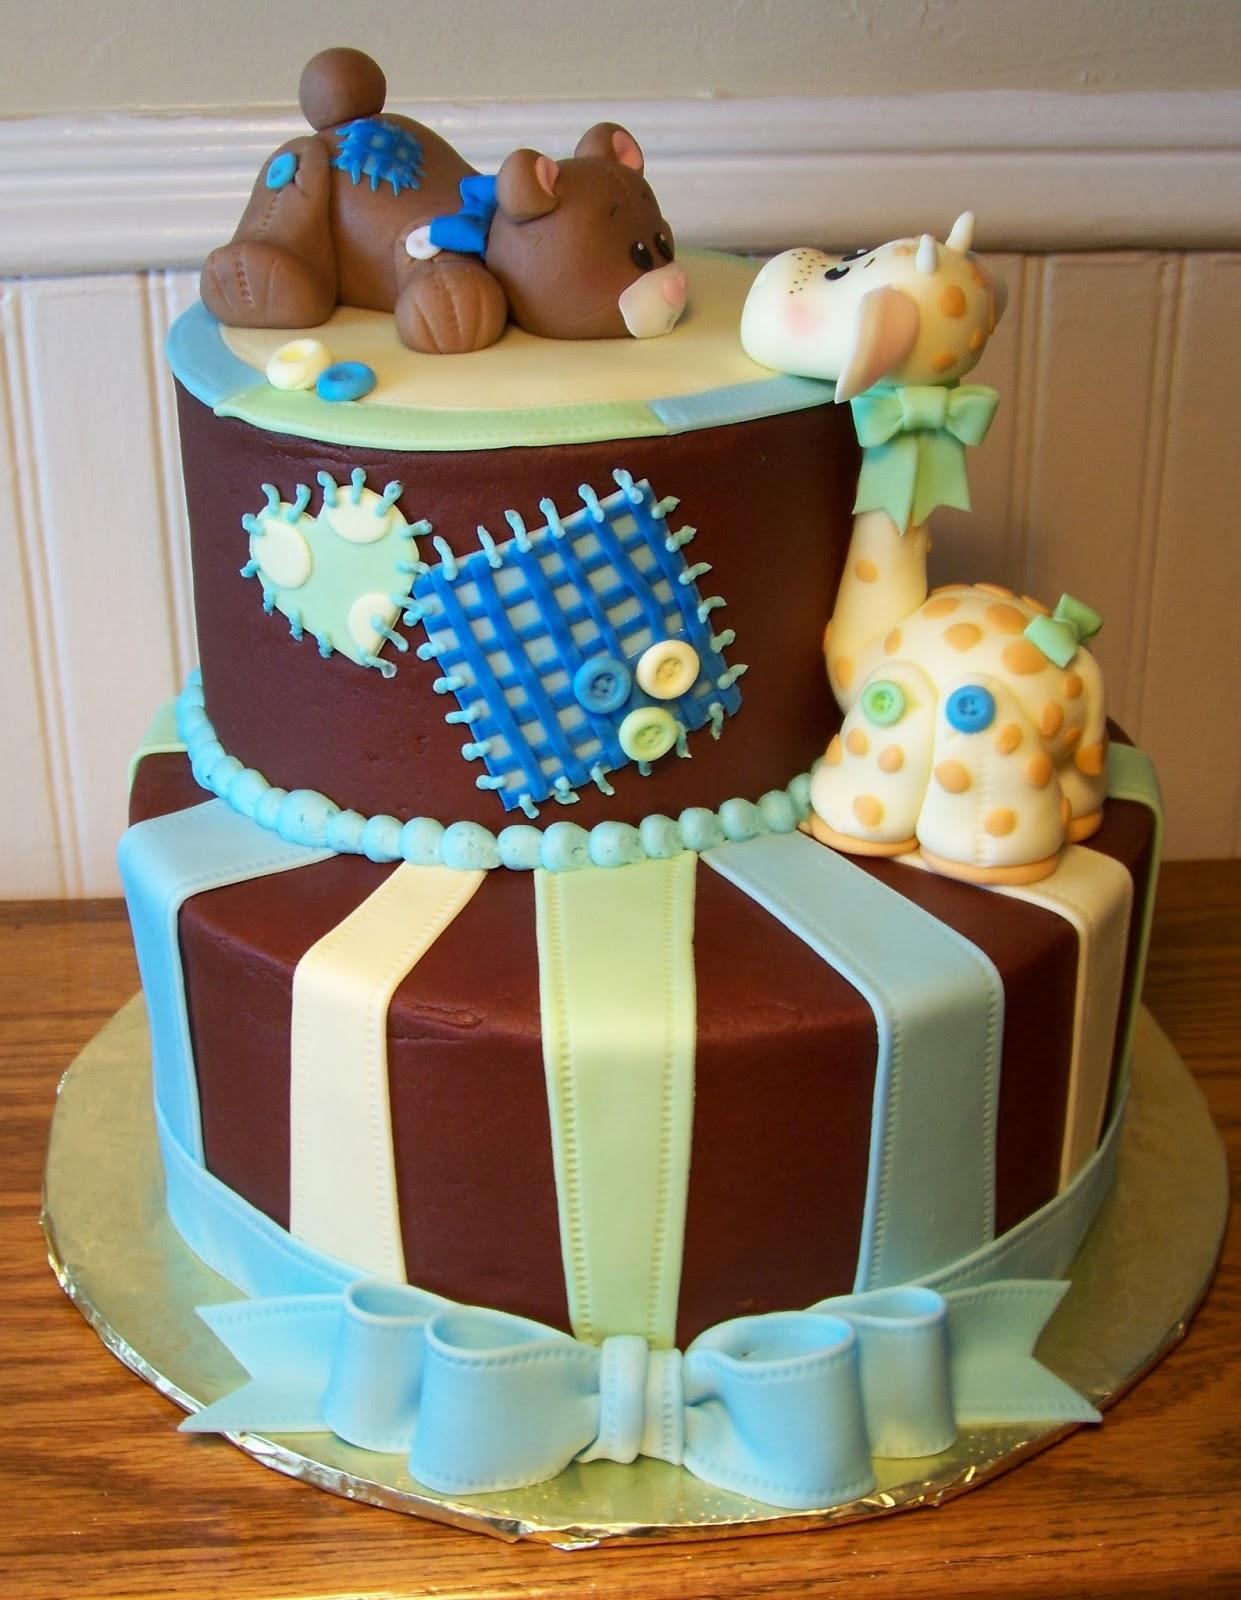 Piece O' Cake Creations